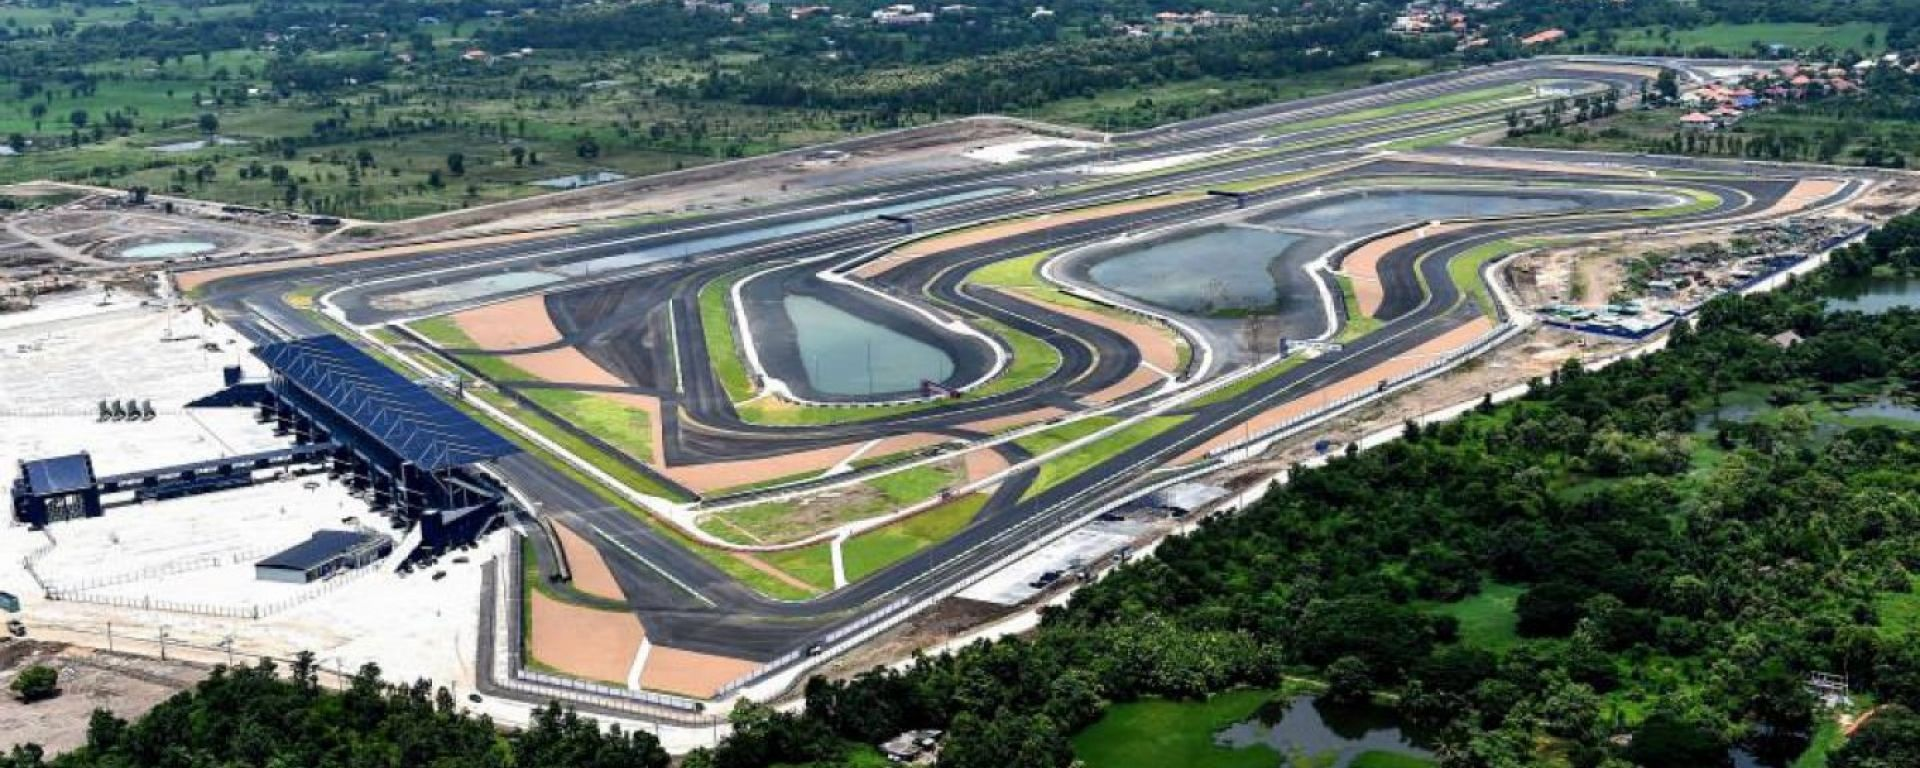 MotoGP Buriram Thailandia: Prove libere, qualifiche, risultati gara